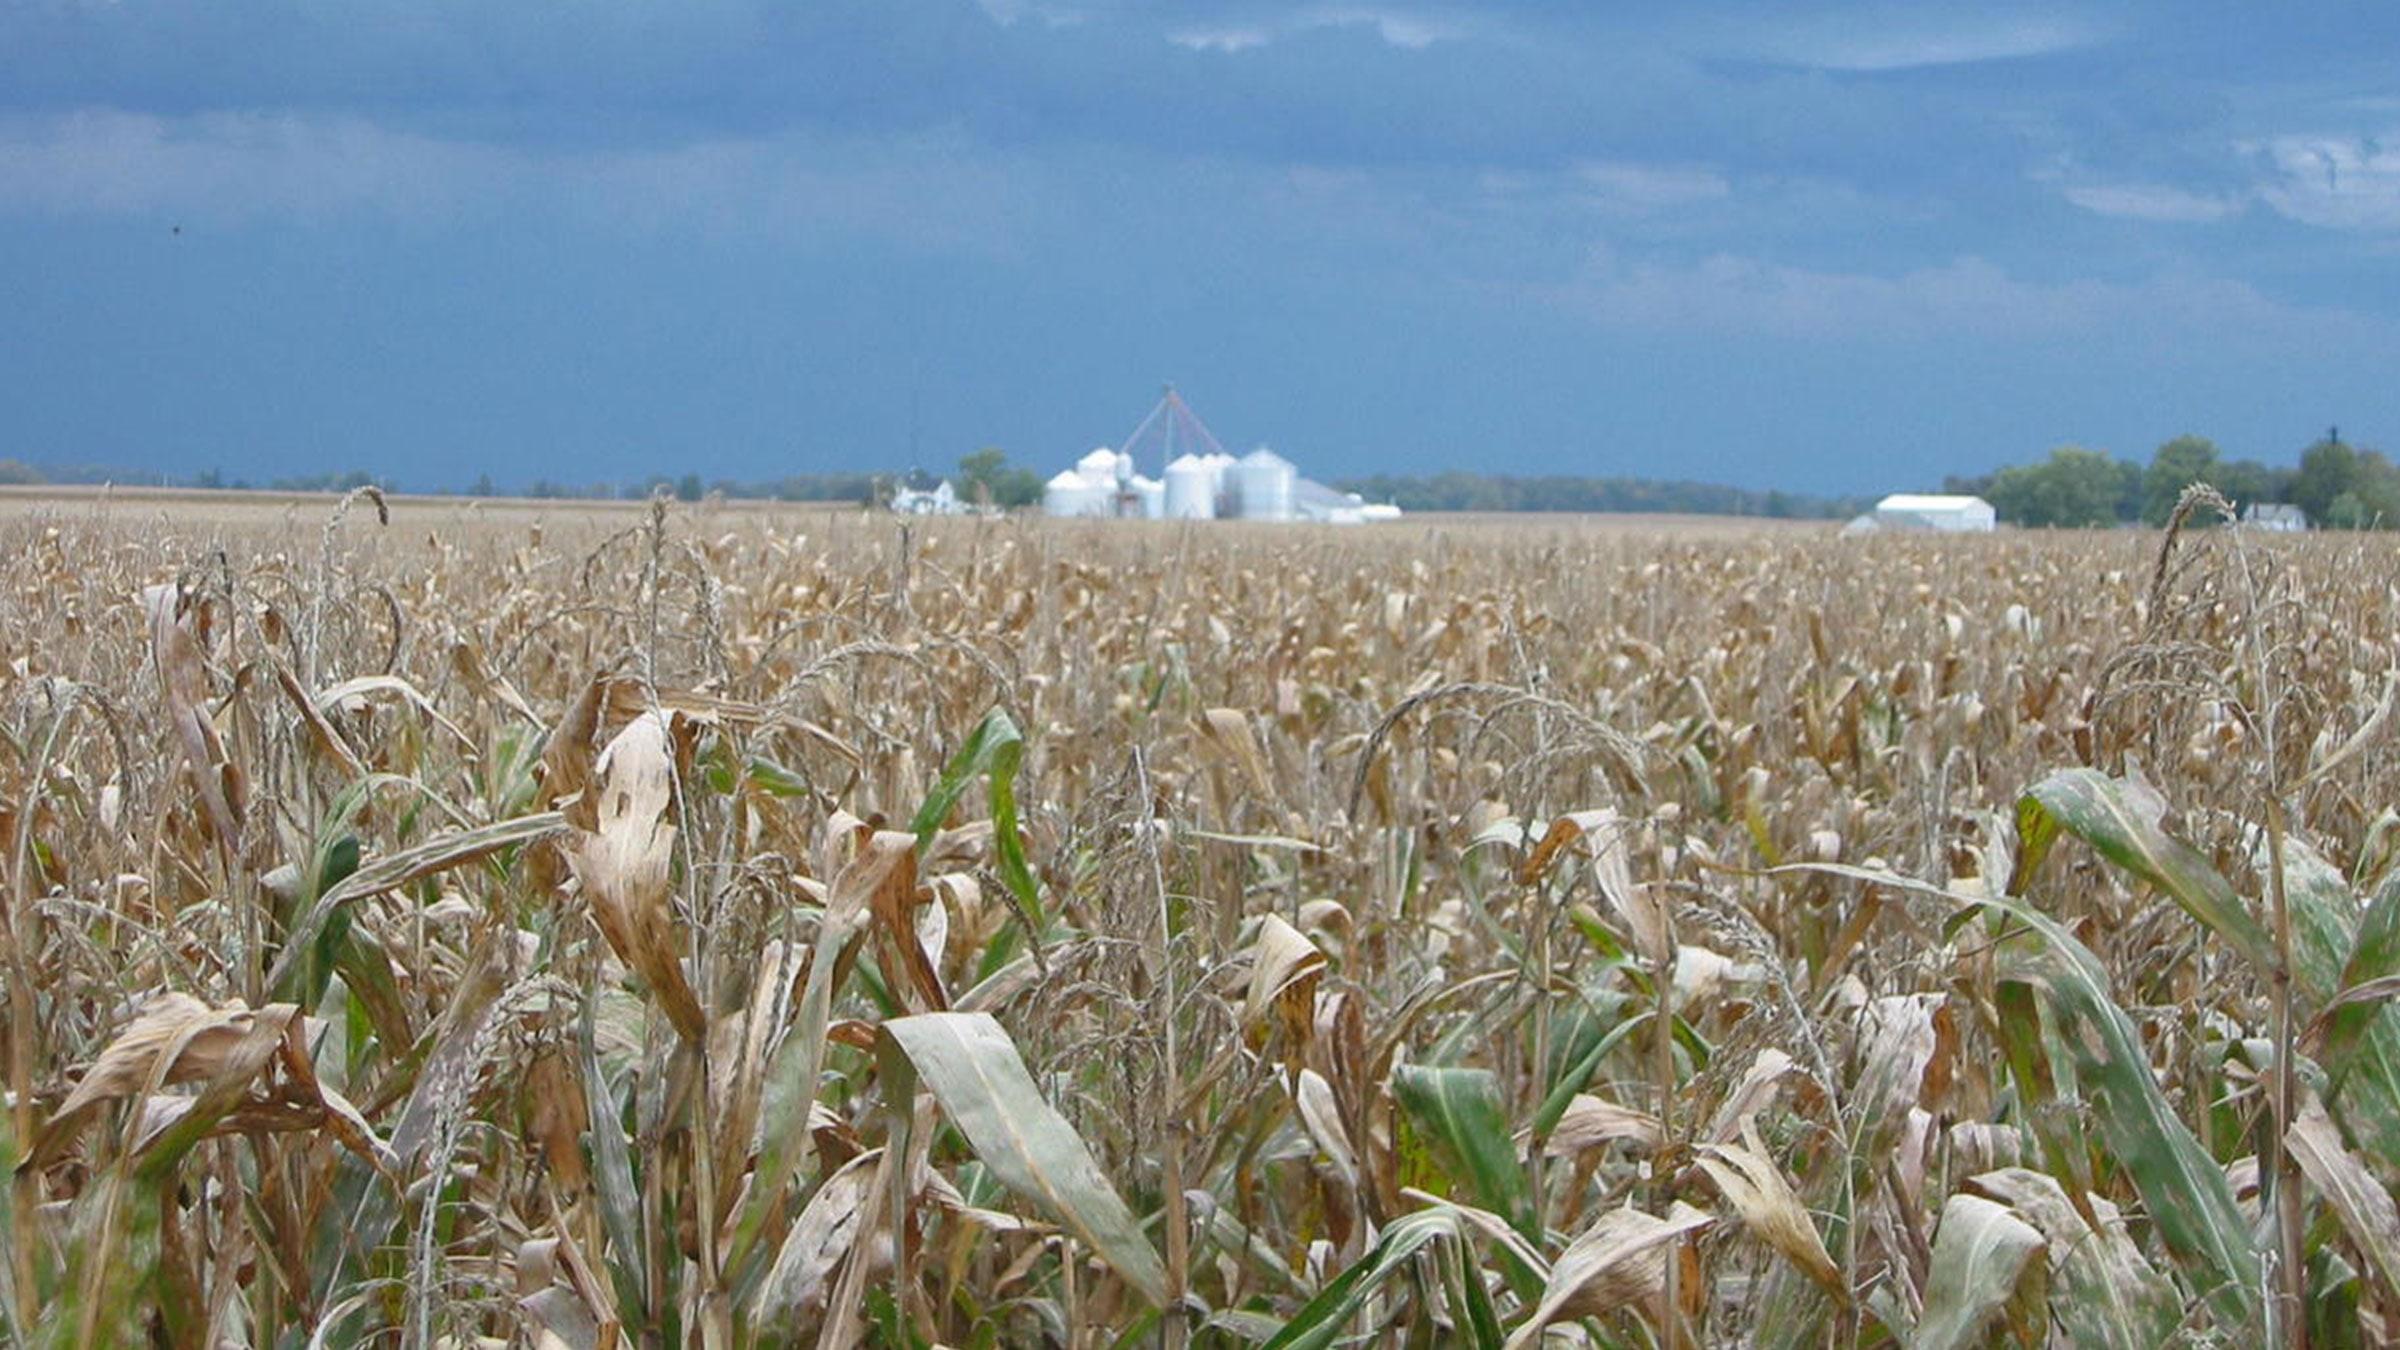 Food and Life: The World According to Monsanto